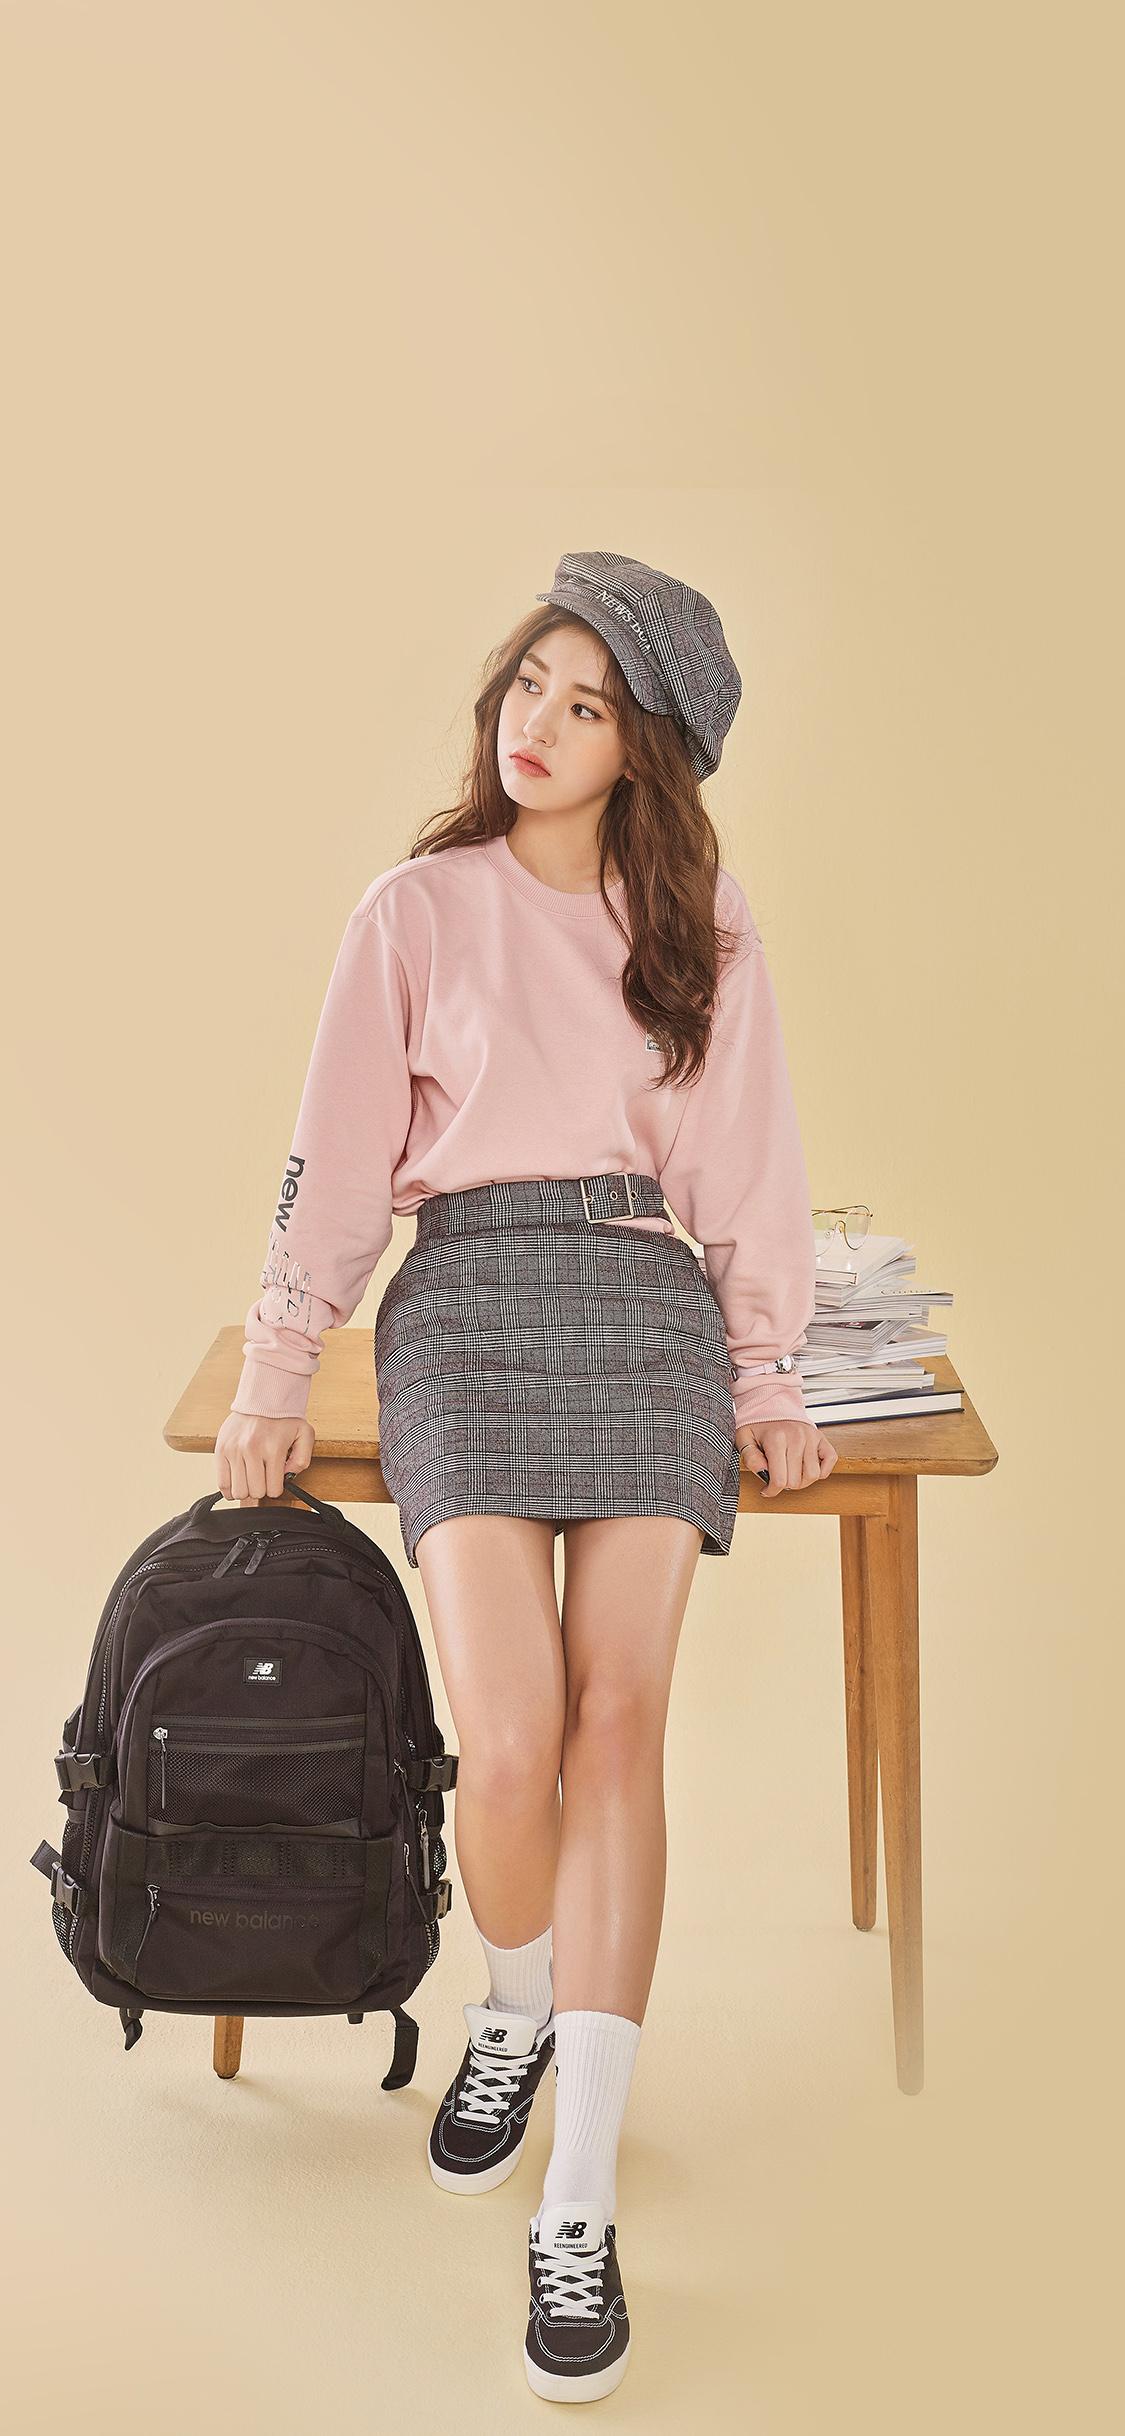 Simple Girl Wallpaper Com Hm04 Somi Ioi Girl Cute Wallpaper